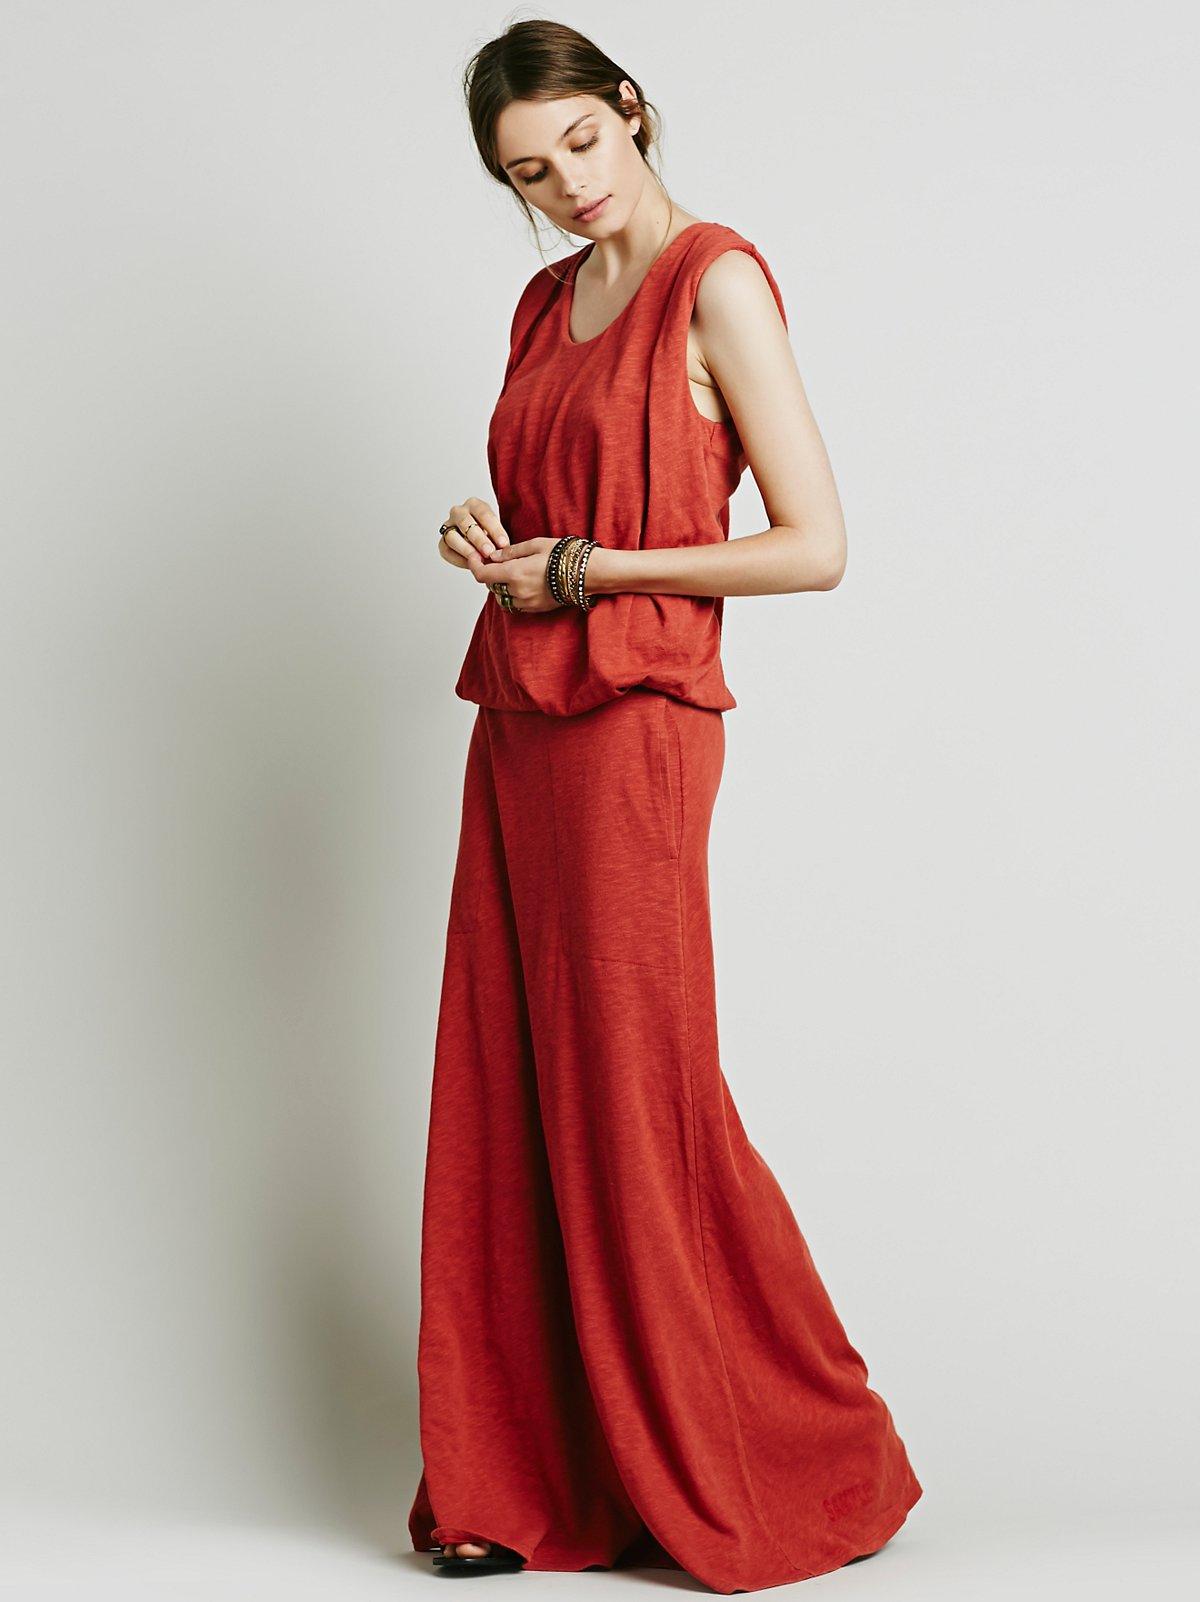 Gallery Night Dress